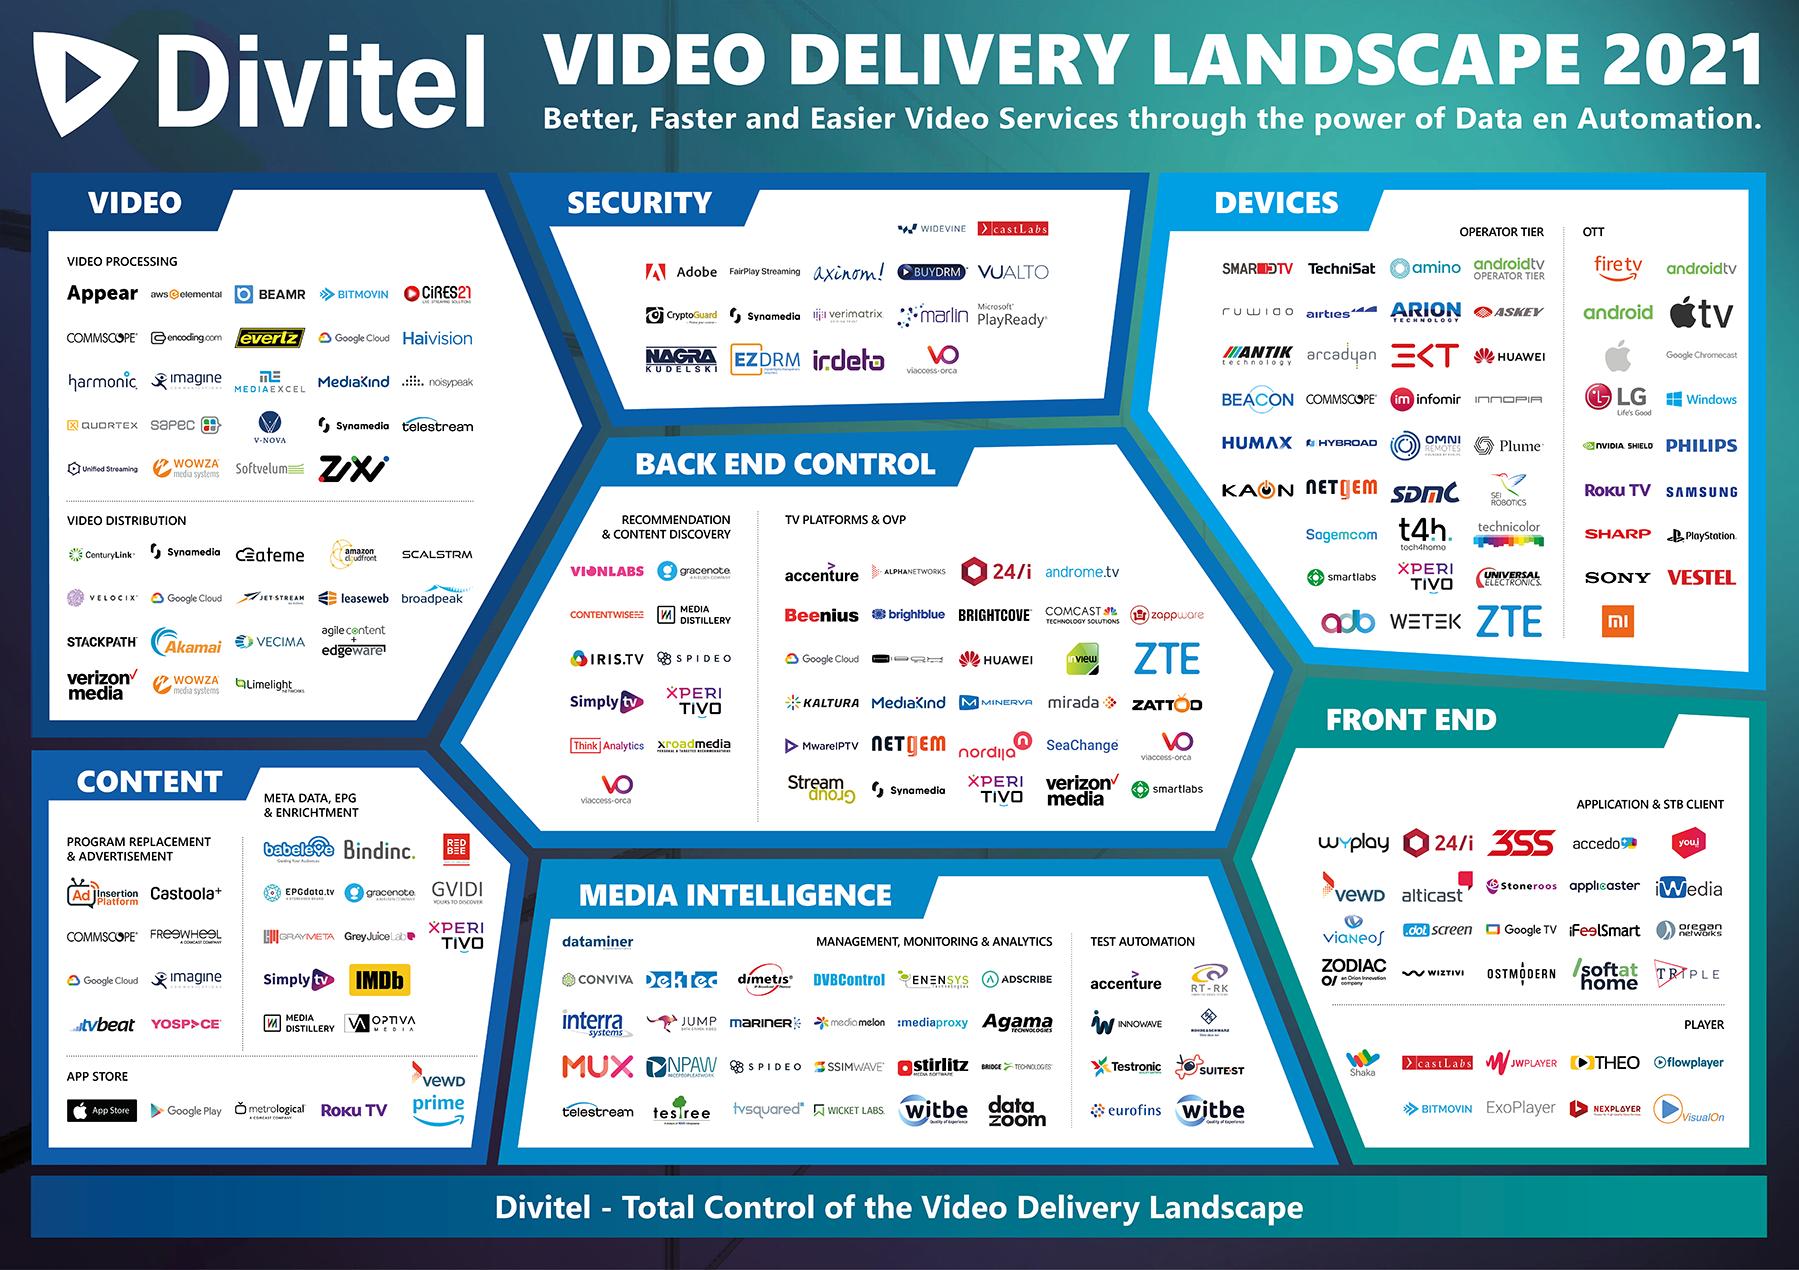 Video Delivery Landscape